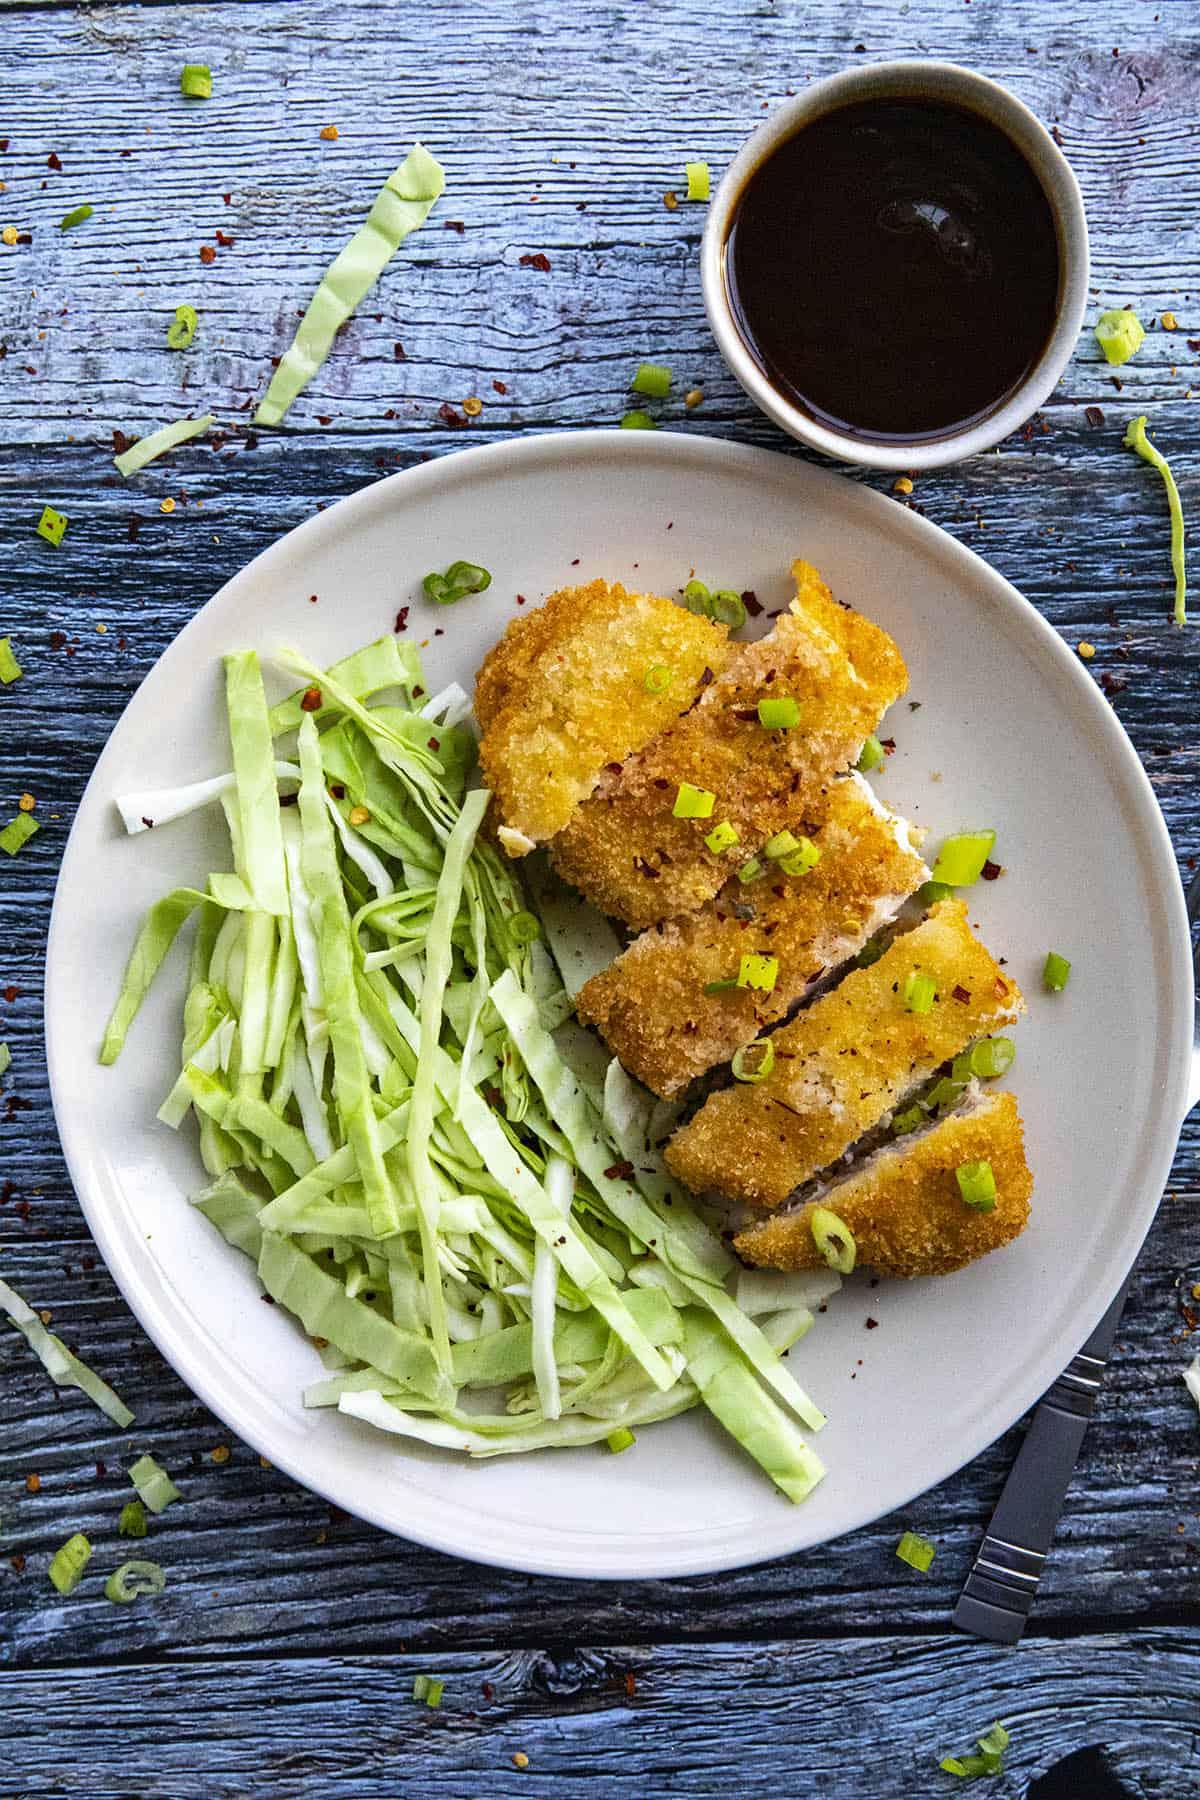 Sliced Pork Katsu on a plate with chopped cabbage